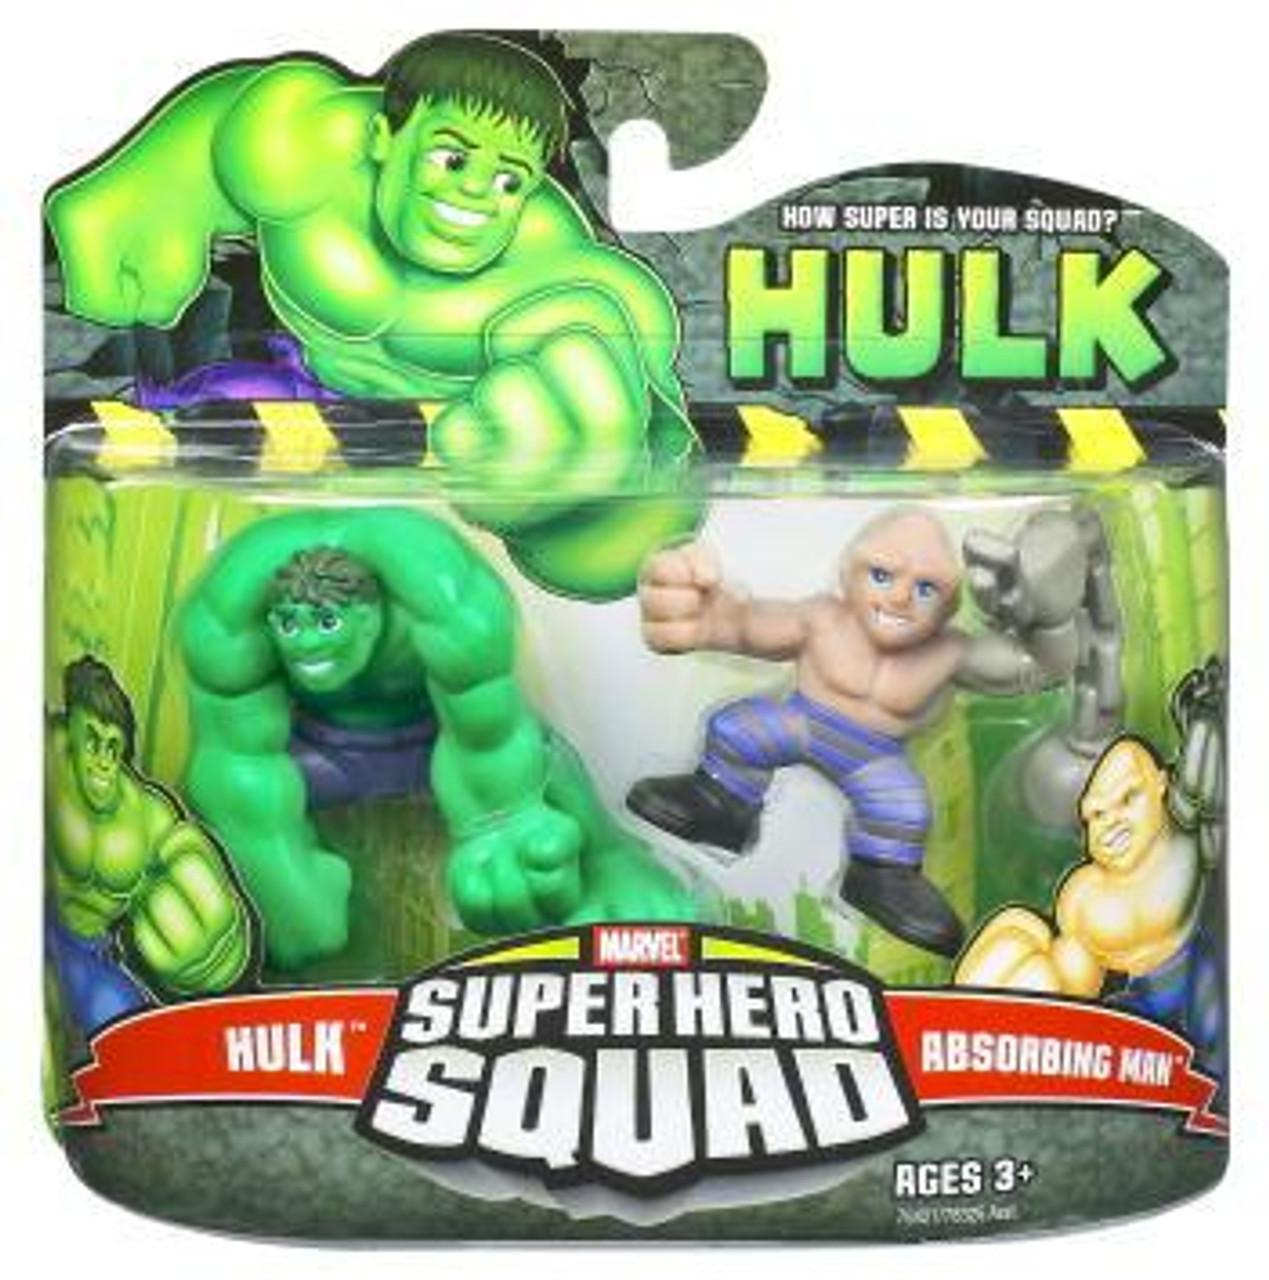 Super Hero Squad Hulk & Absorbing Man Action Figure 2-Pack